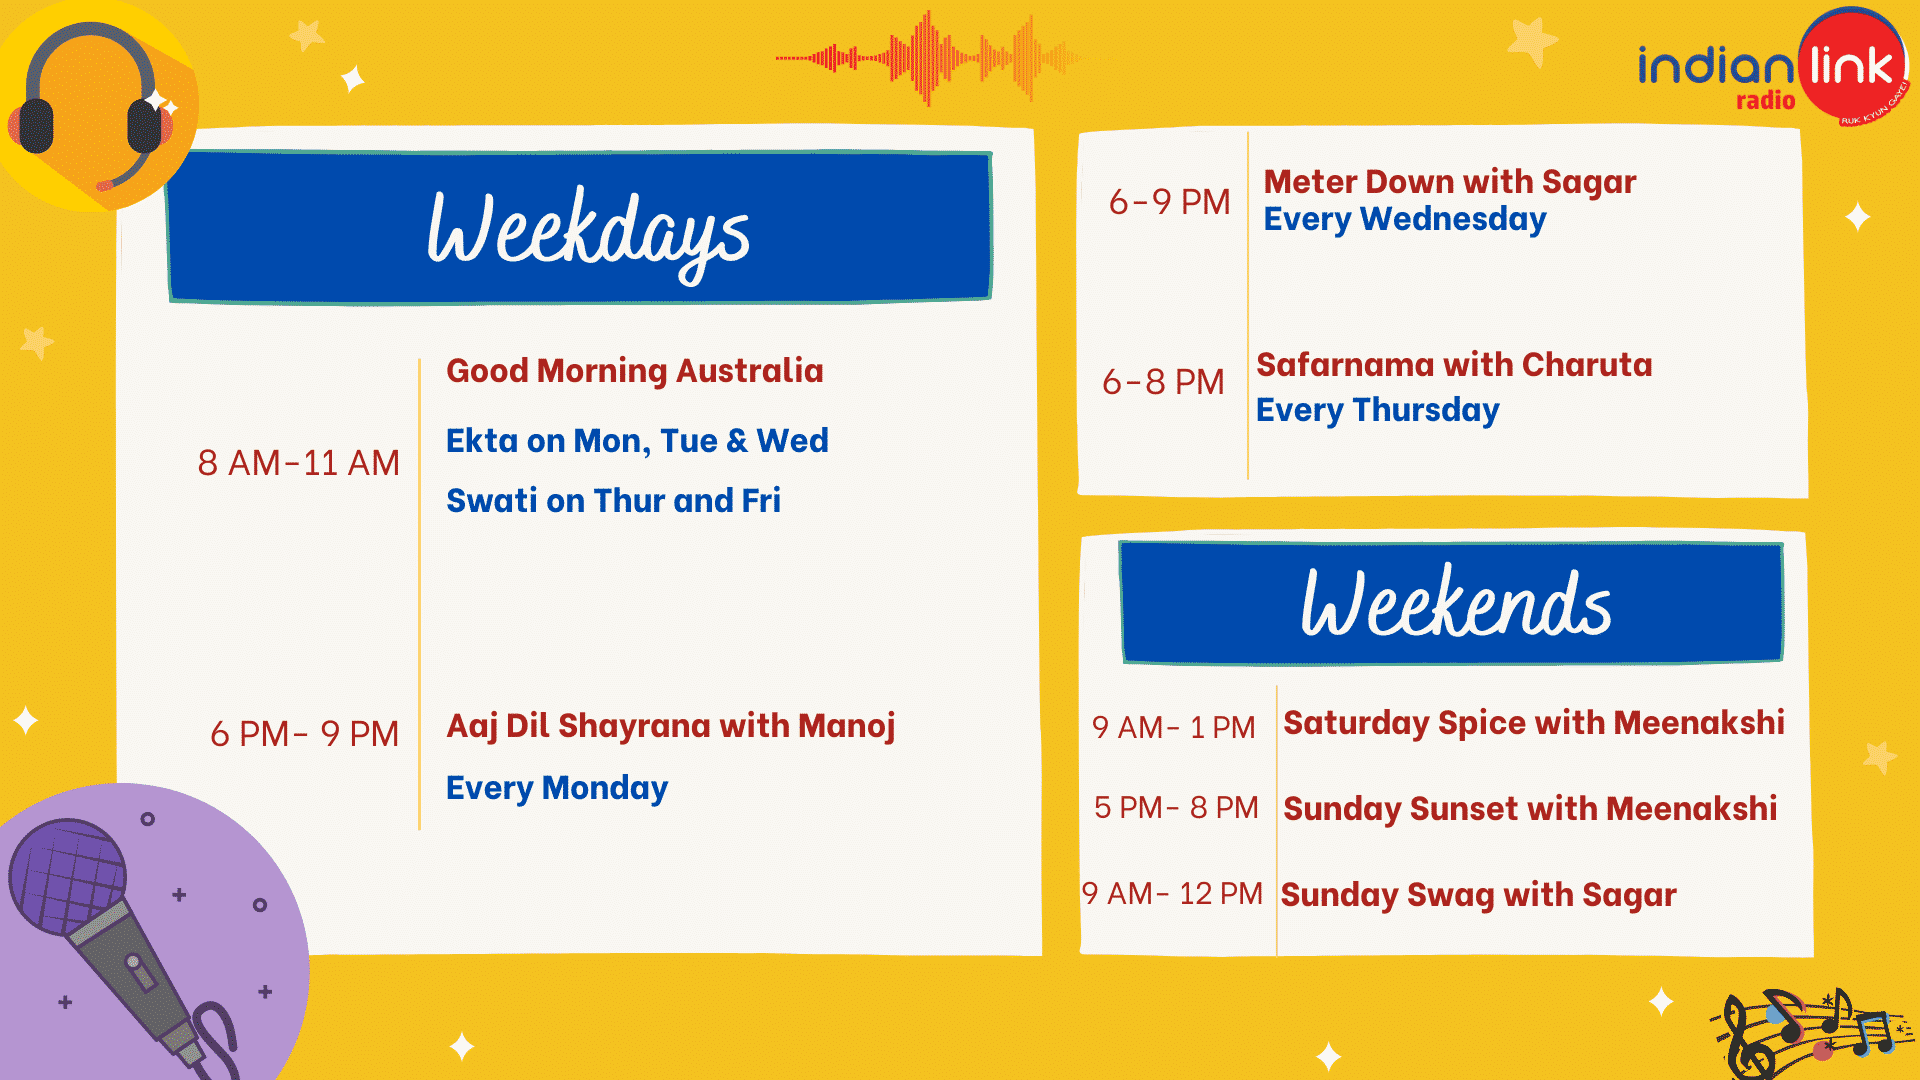 indian link radio Schedule